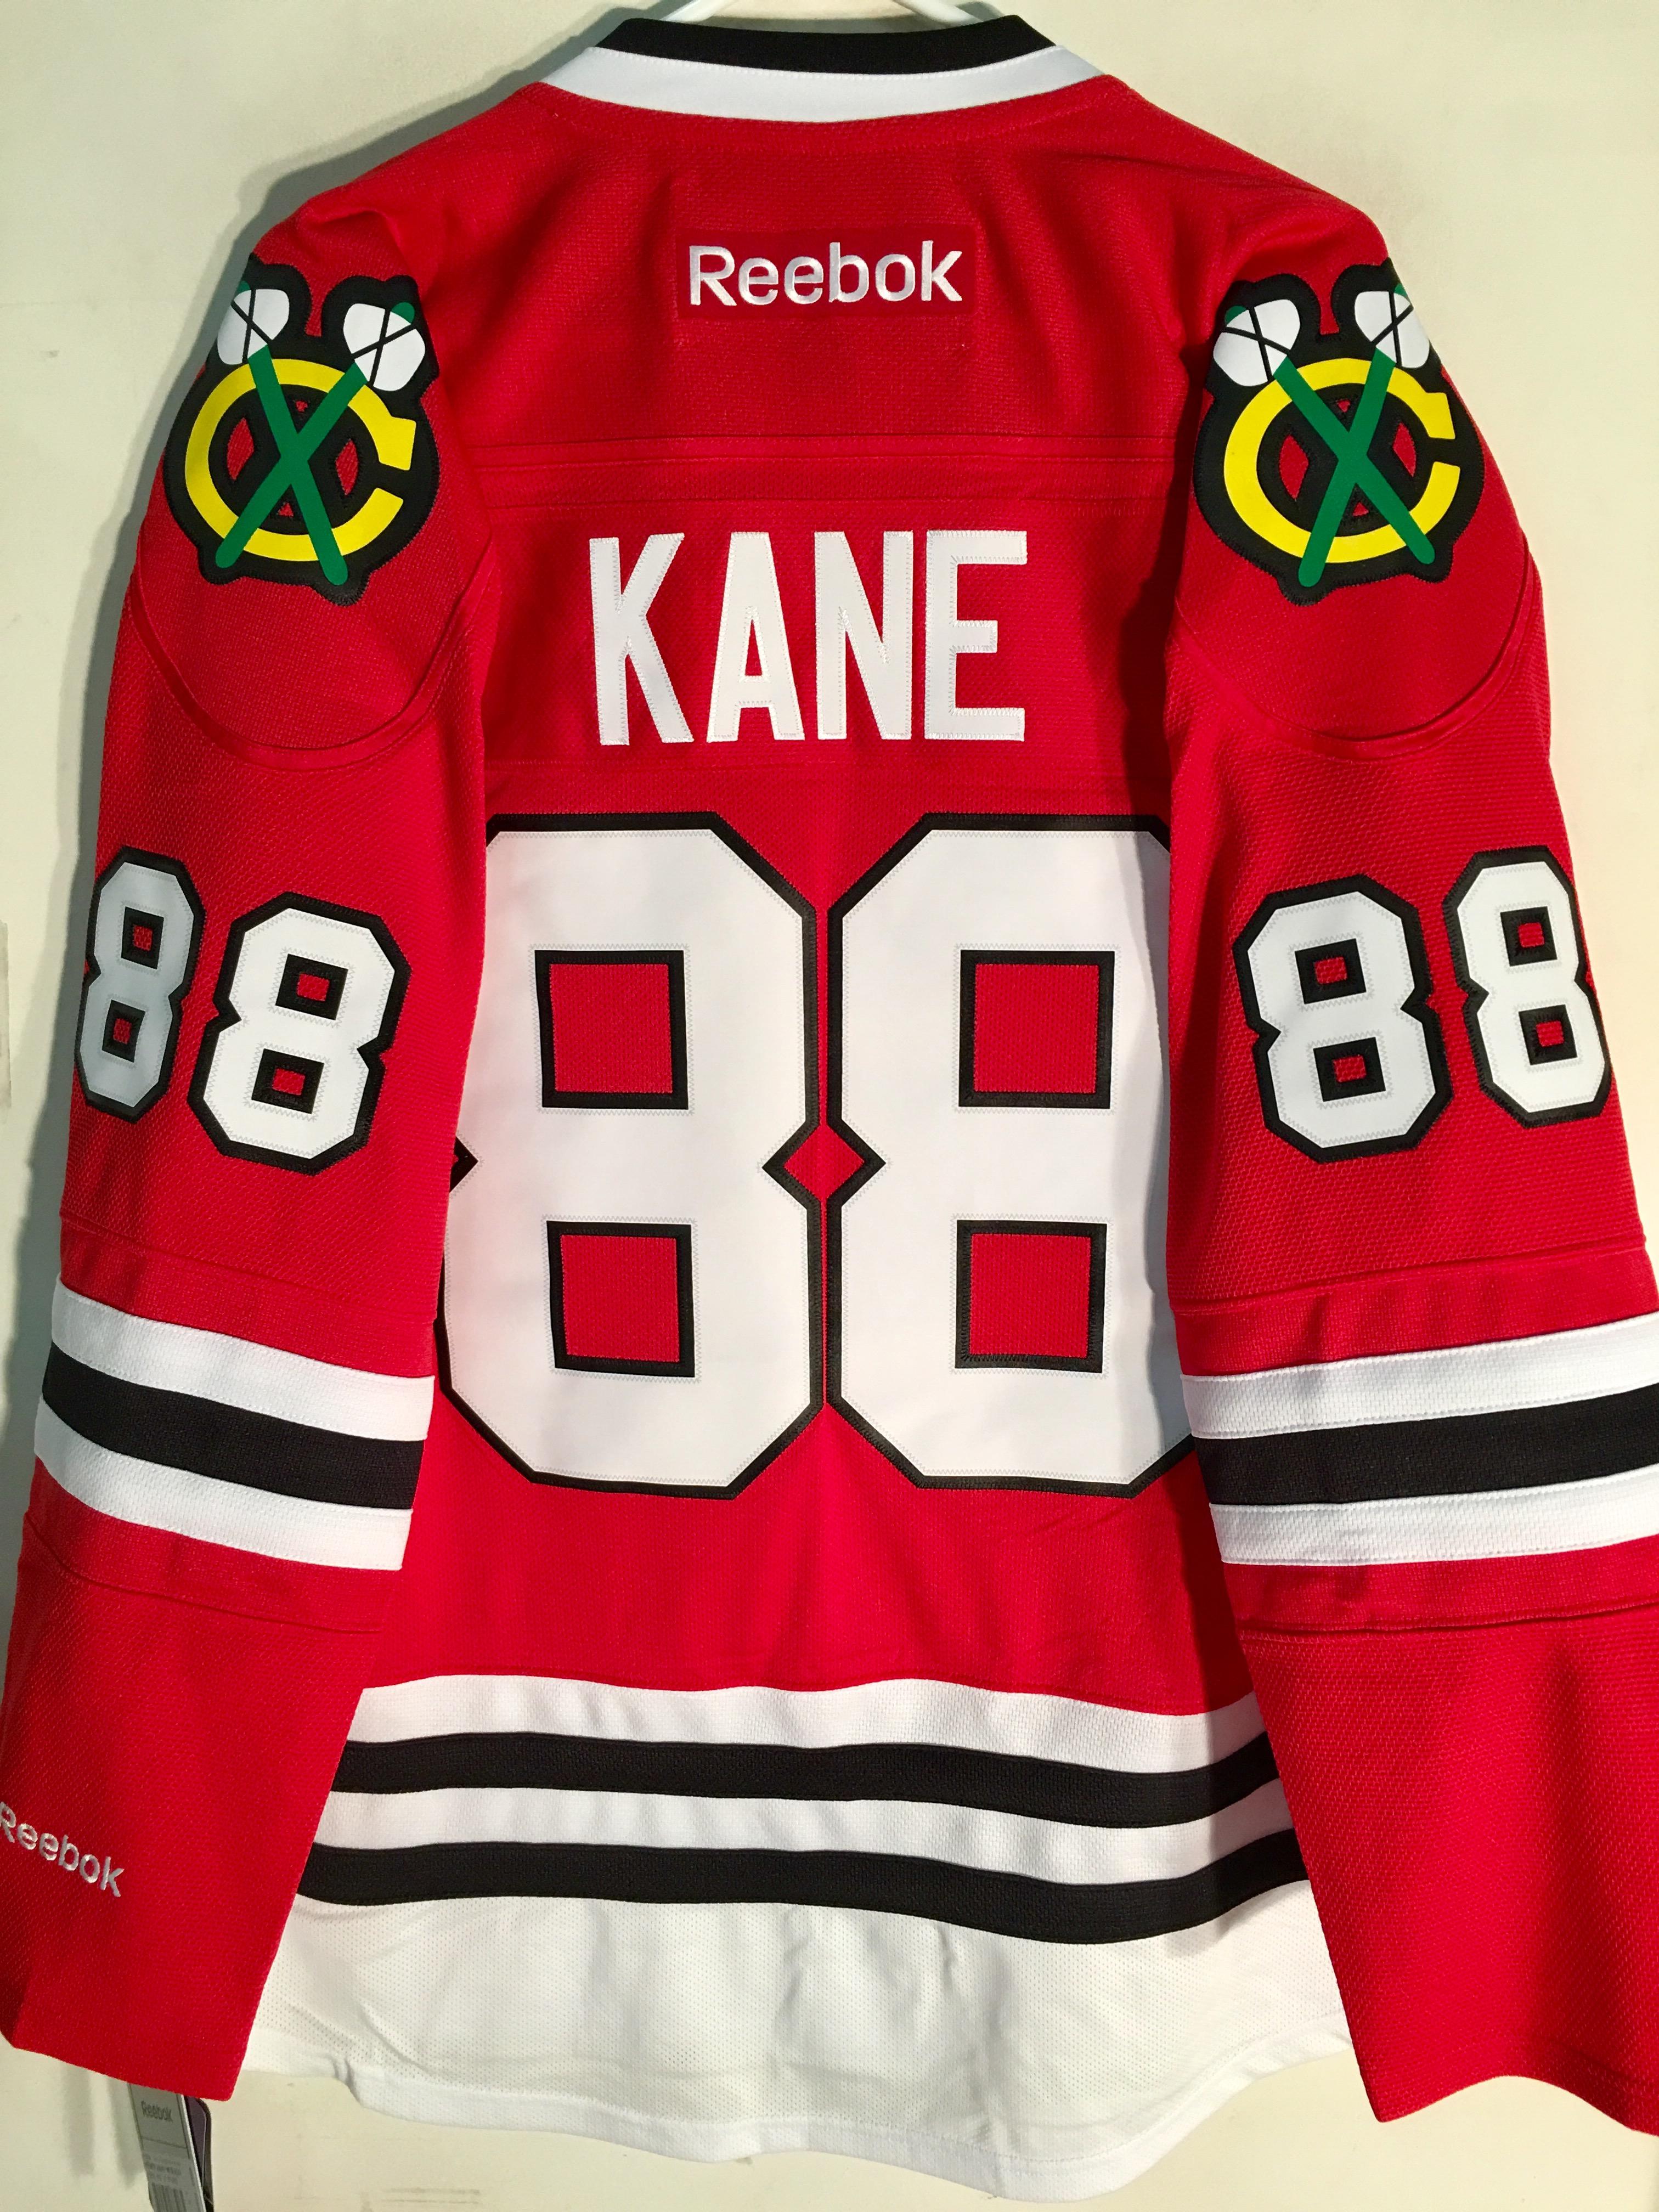 48a4783b4 Reebok Premier NHL Jersey Chicago Blackhawks Patrick Kane Red sz S ...